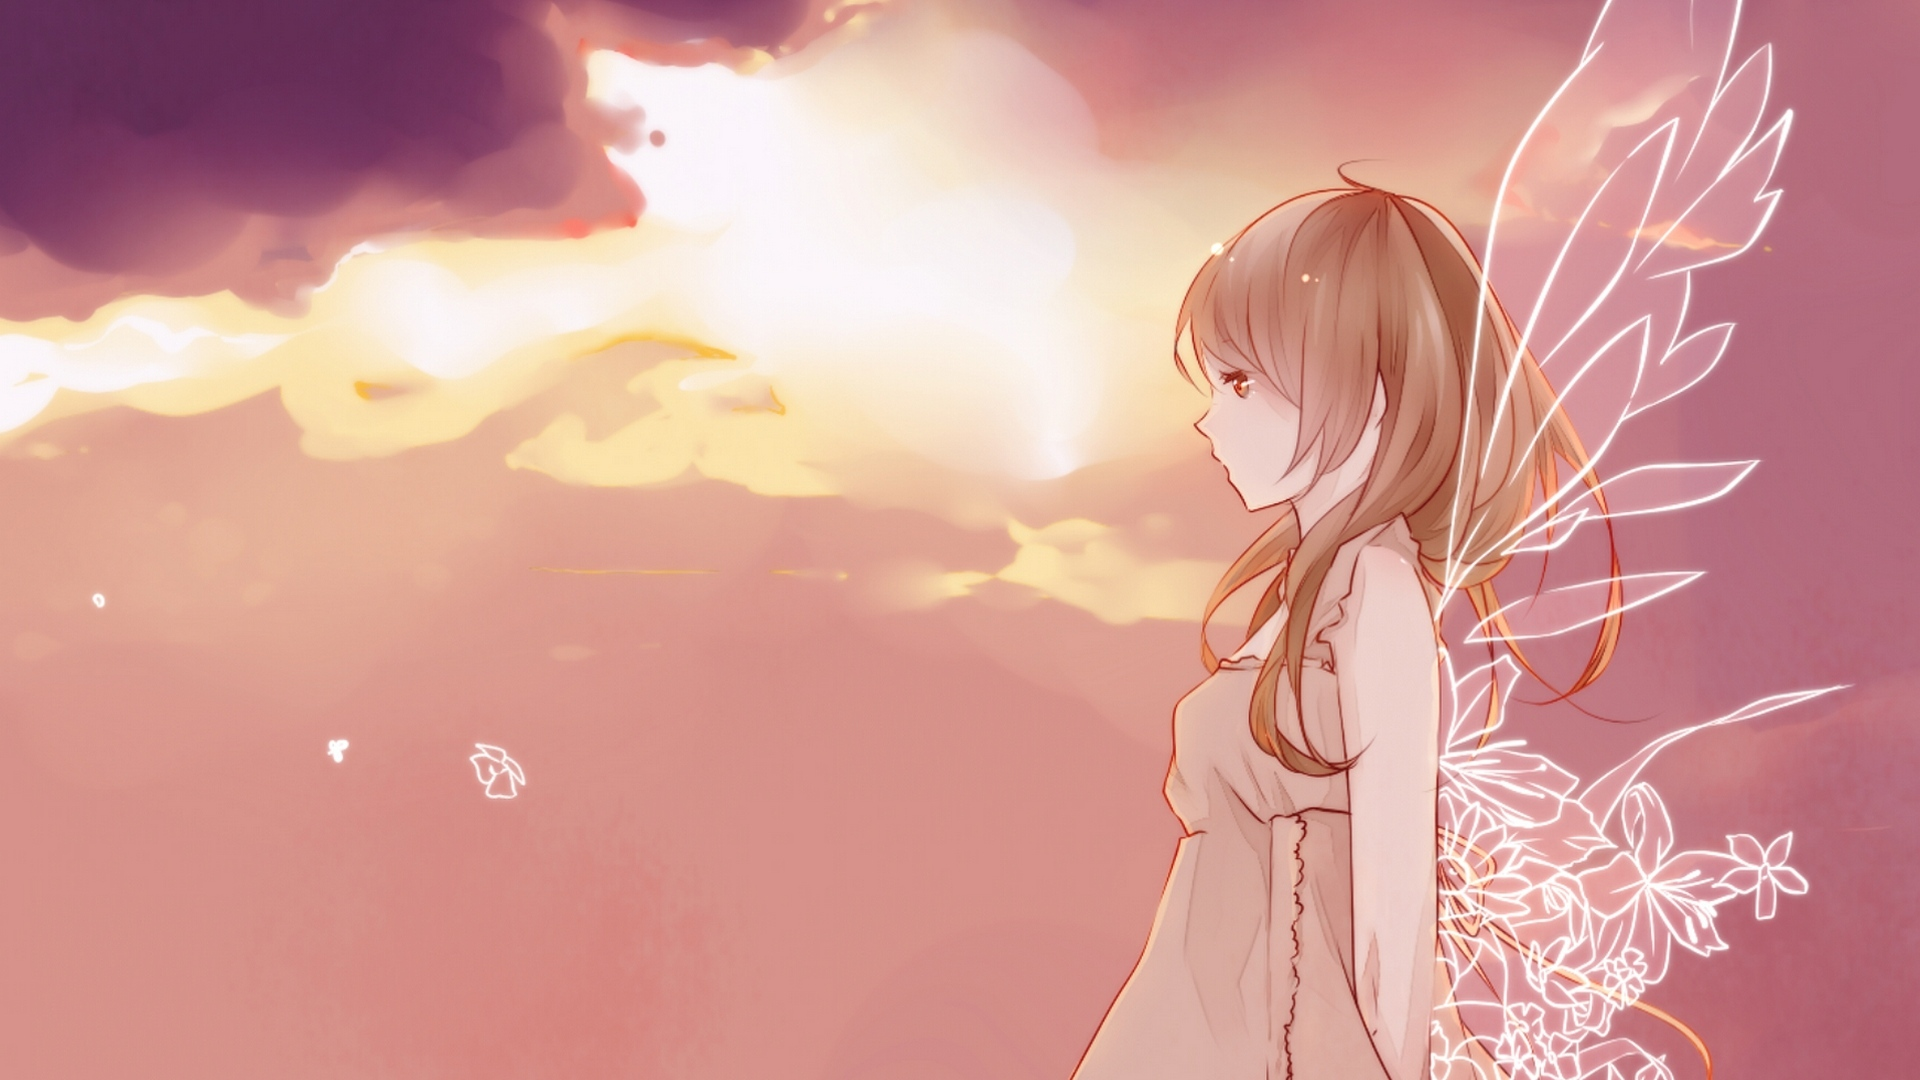 HD Hintergrundbilder sonnenuntergang himmel mädchen flügel